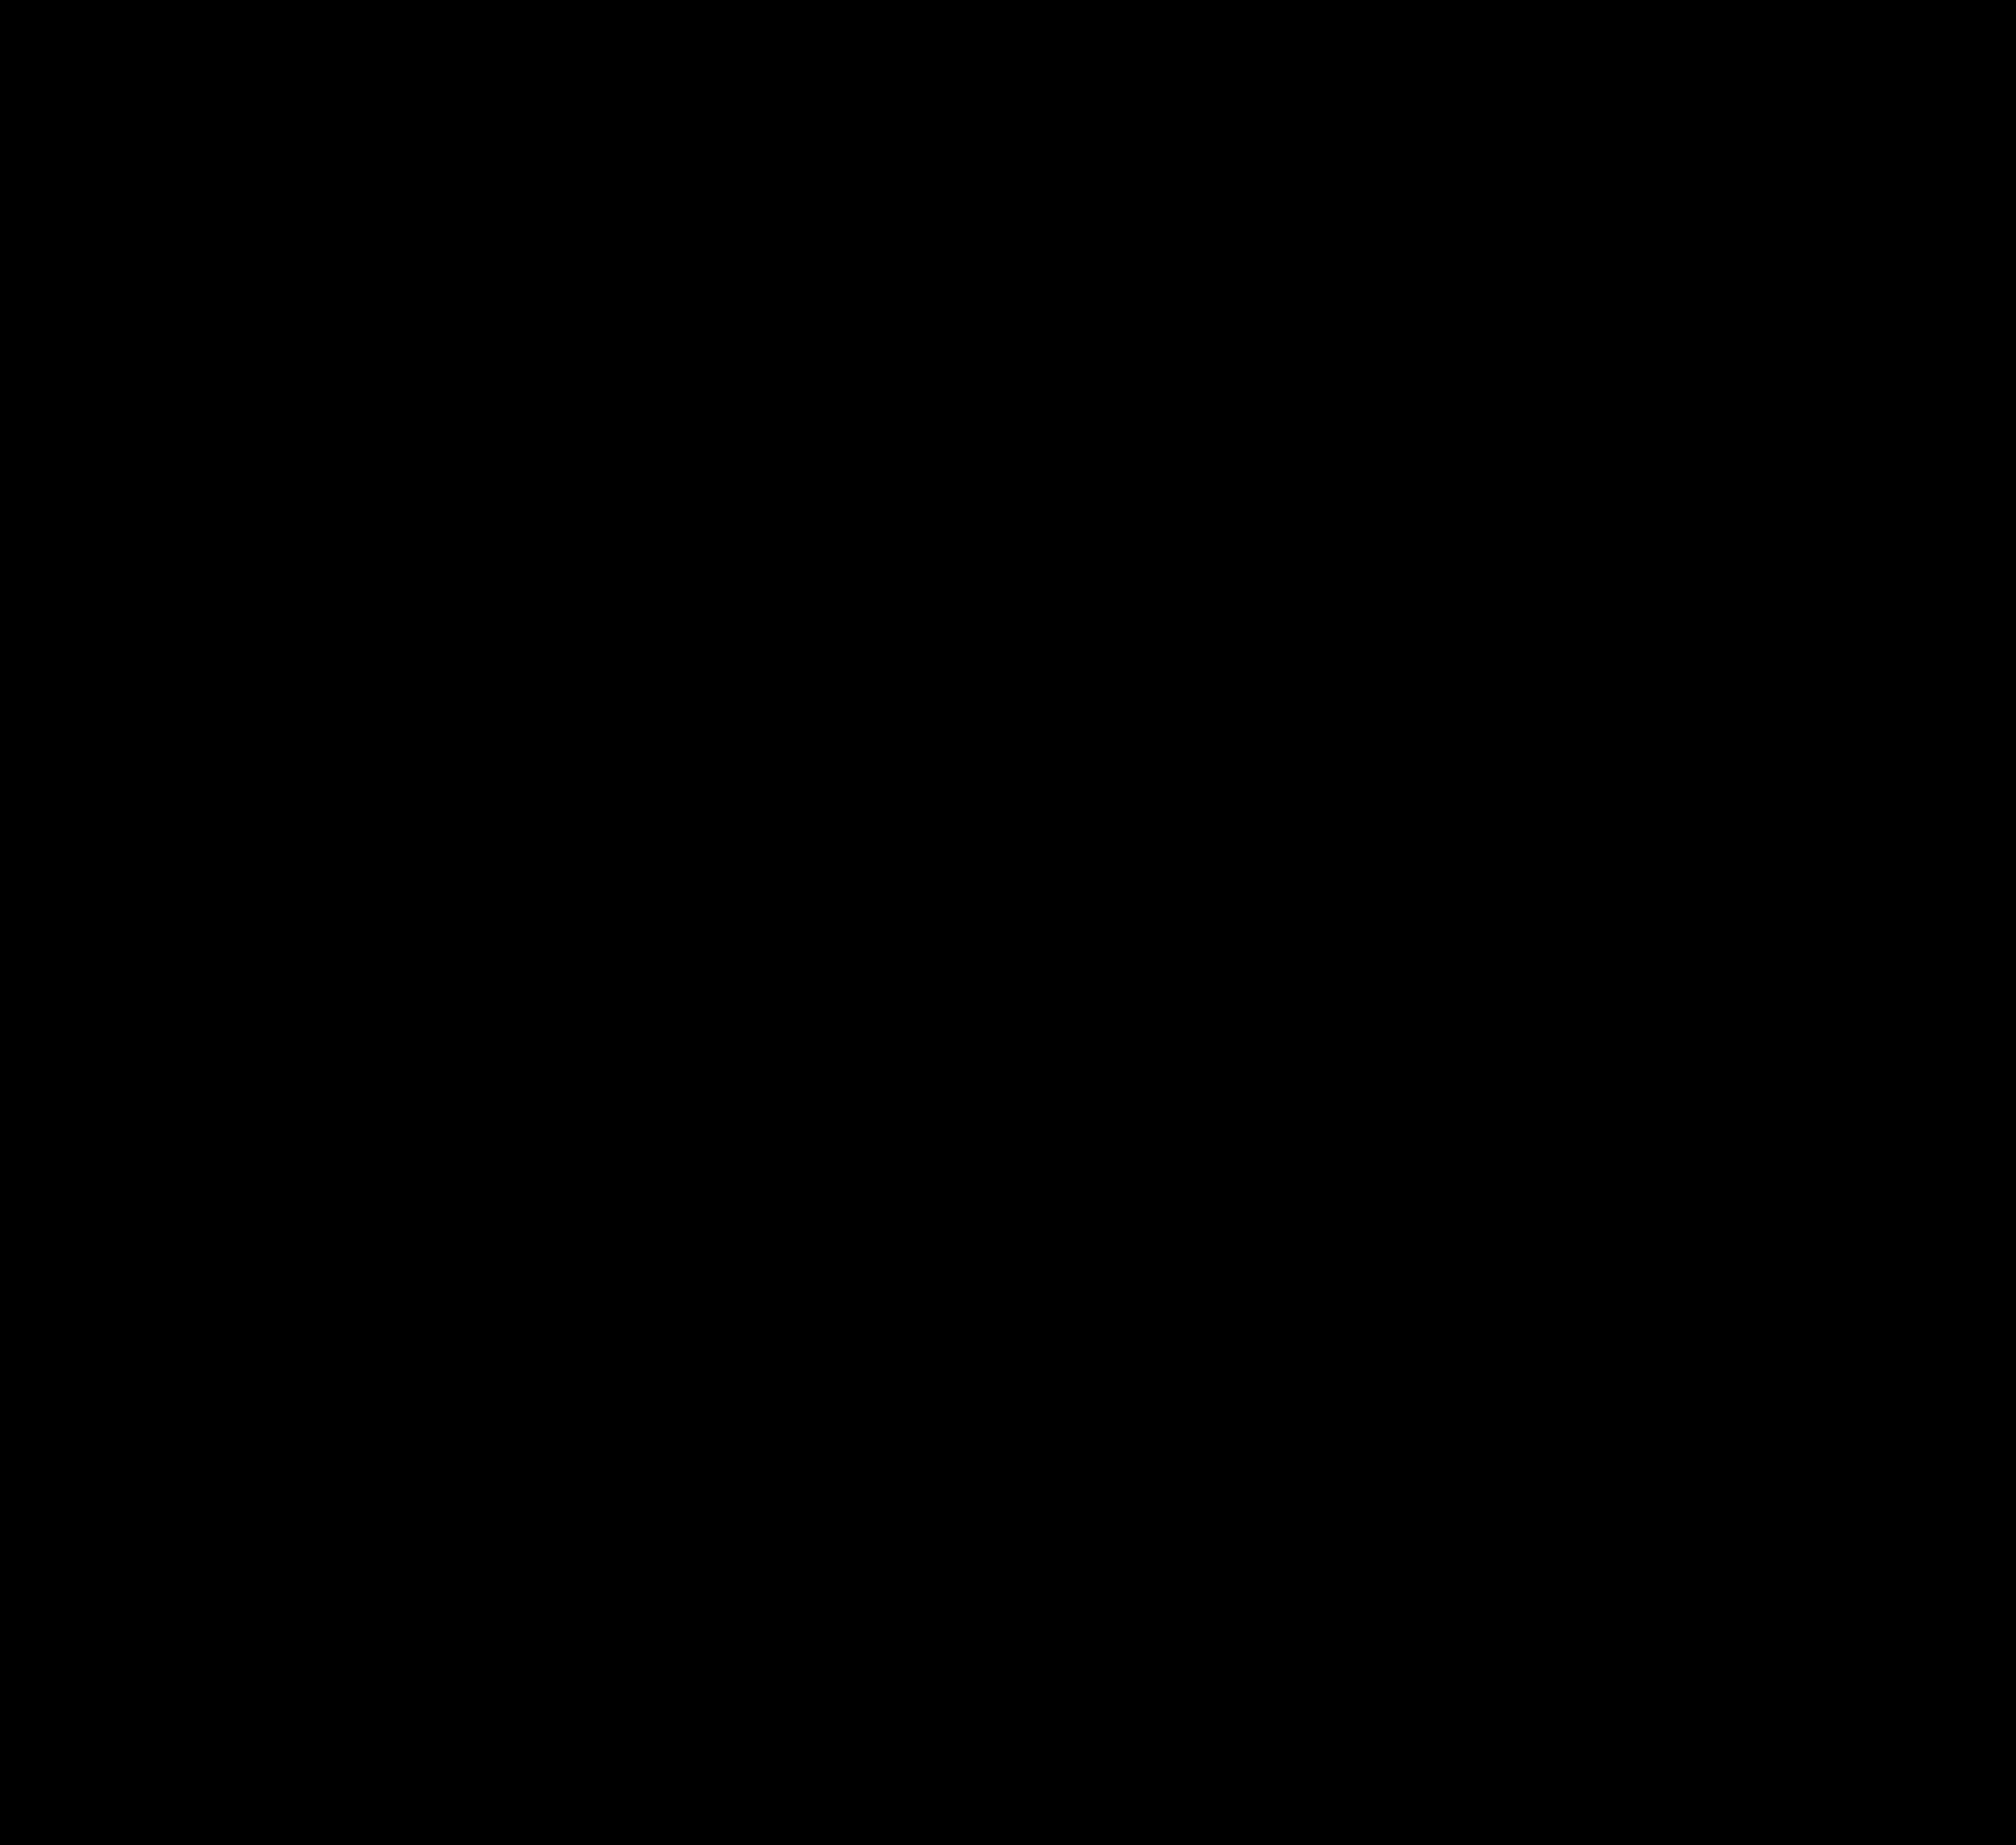 Clipart solar system symbols solar system symbols buycottarizona